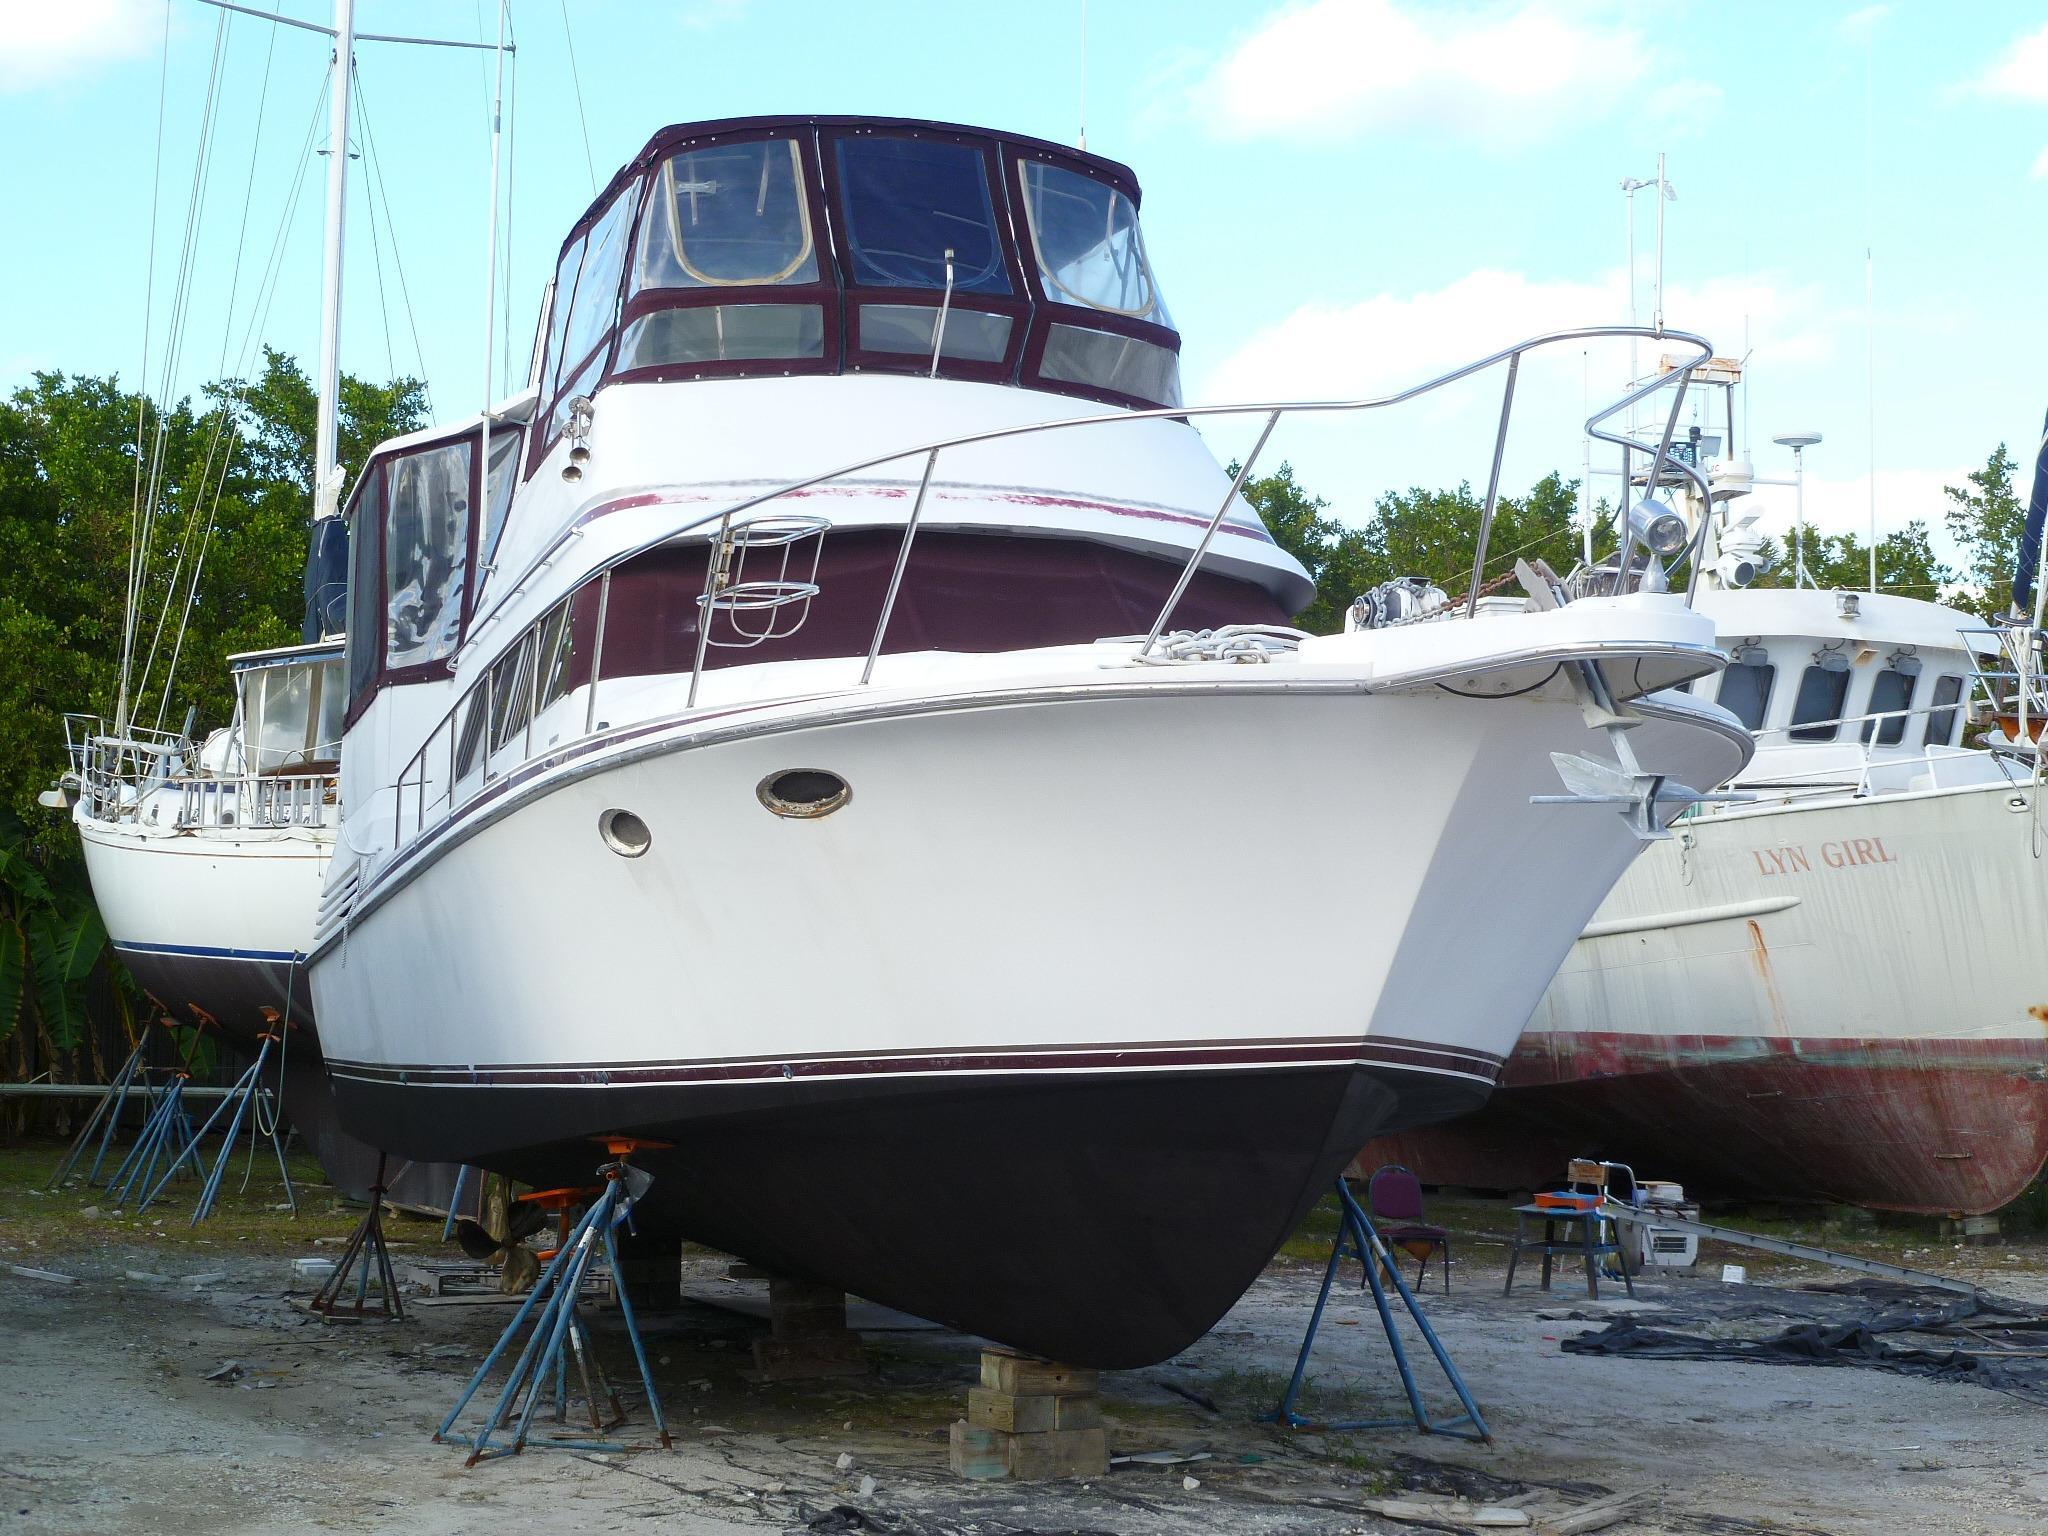 40' Trojan 1988 12 Meter Motor Yacht